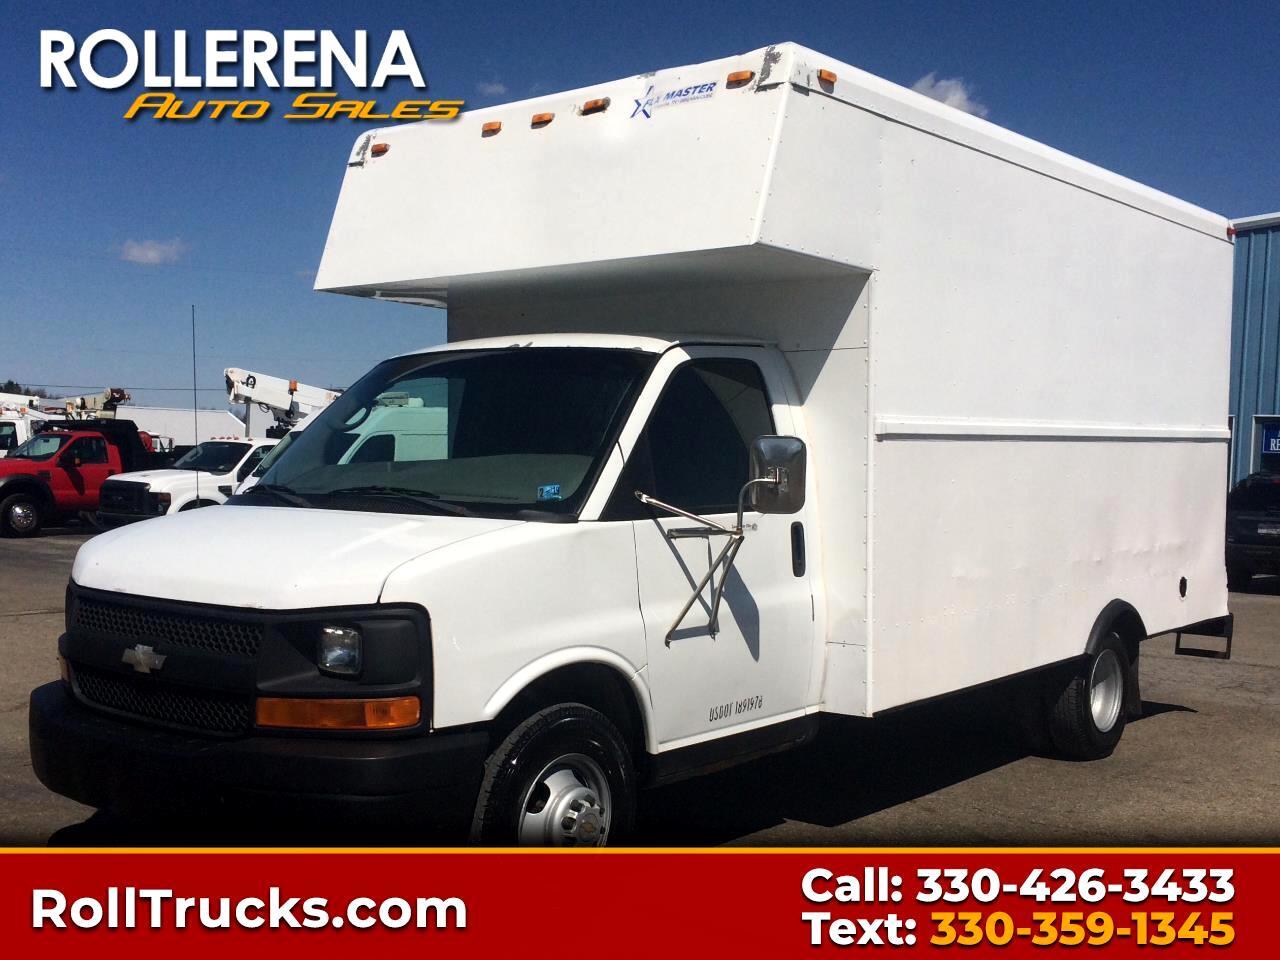 2004 Chevrolet 3500 Box Truck